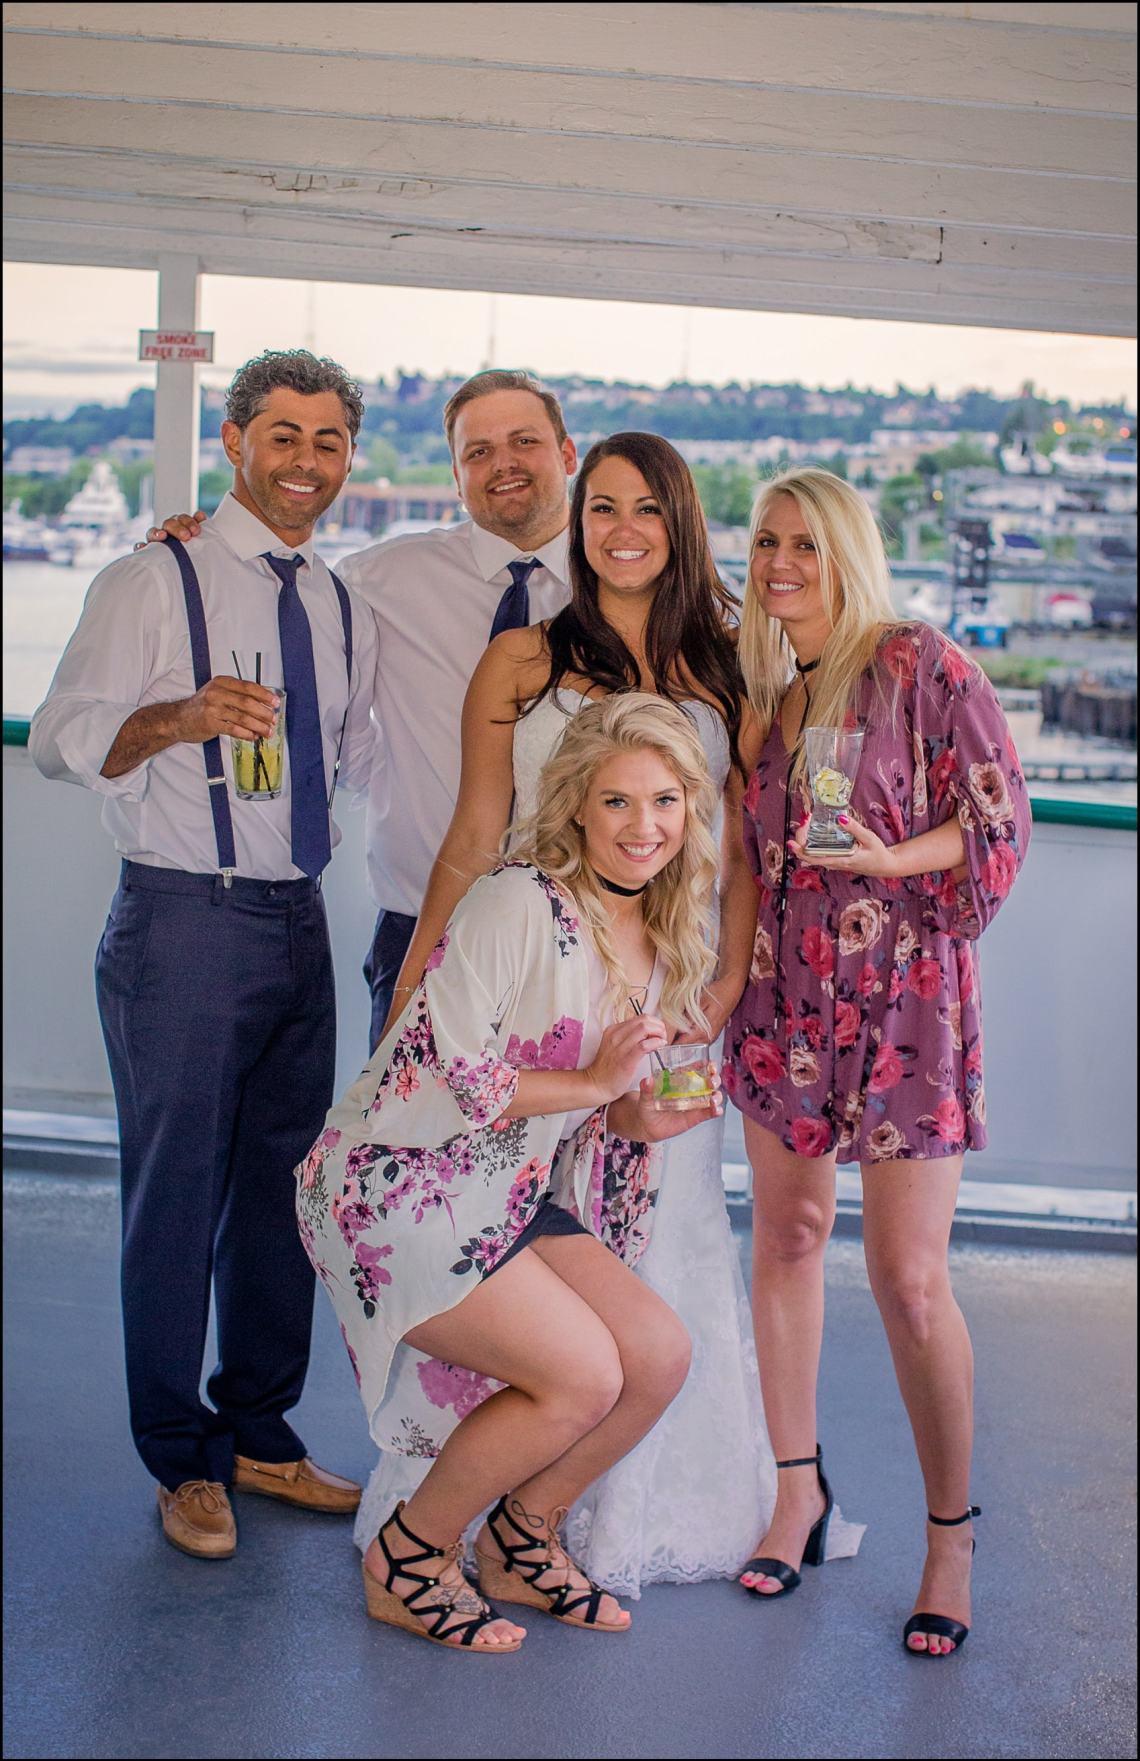 ogden reception420 1 LINDSEY & KENNY HOMETOWN RECEPTION | THE HISTORIC MV SKANSONIA | SEATTLE, WA